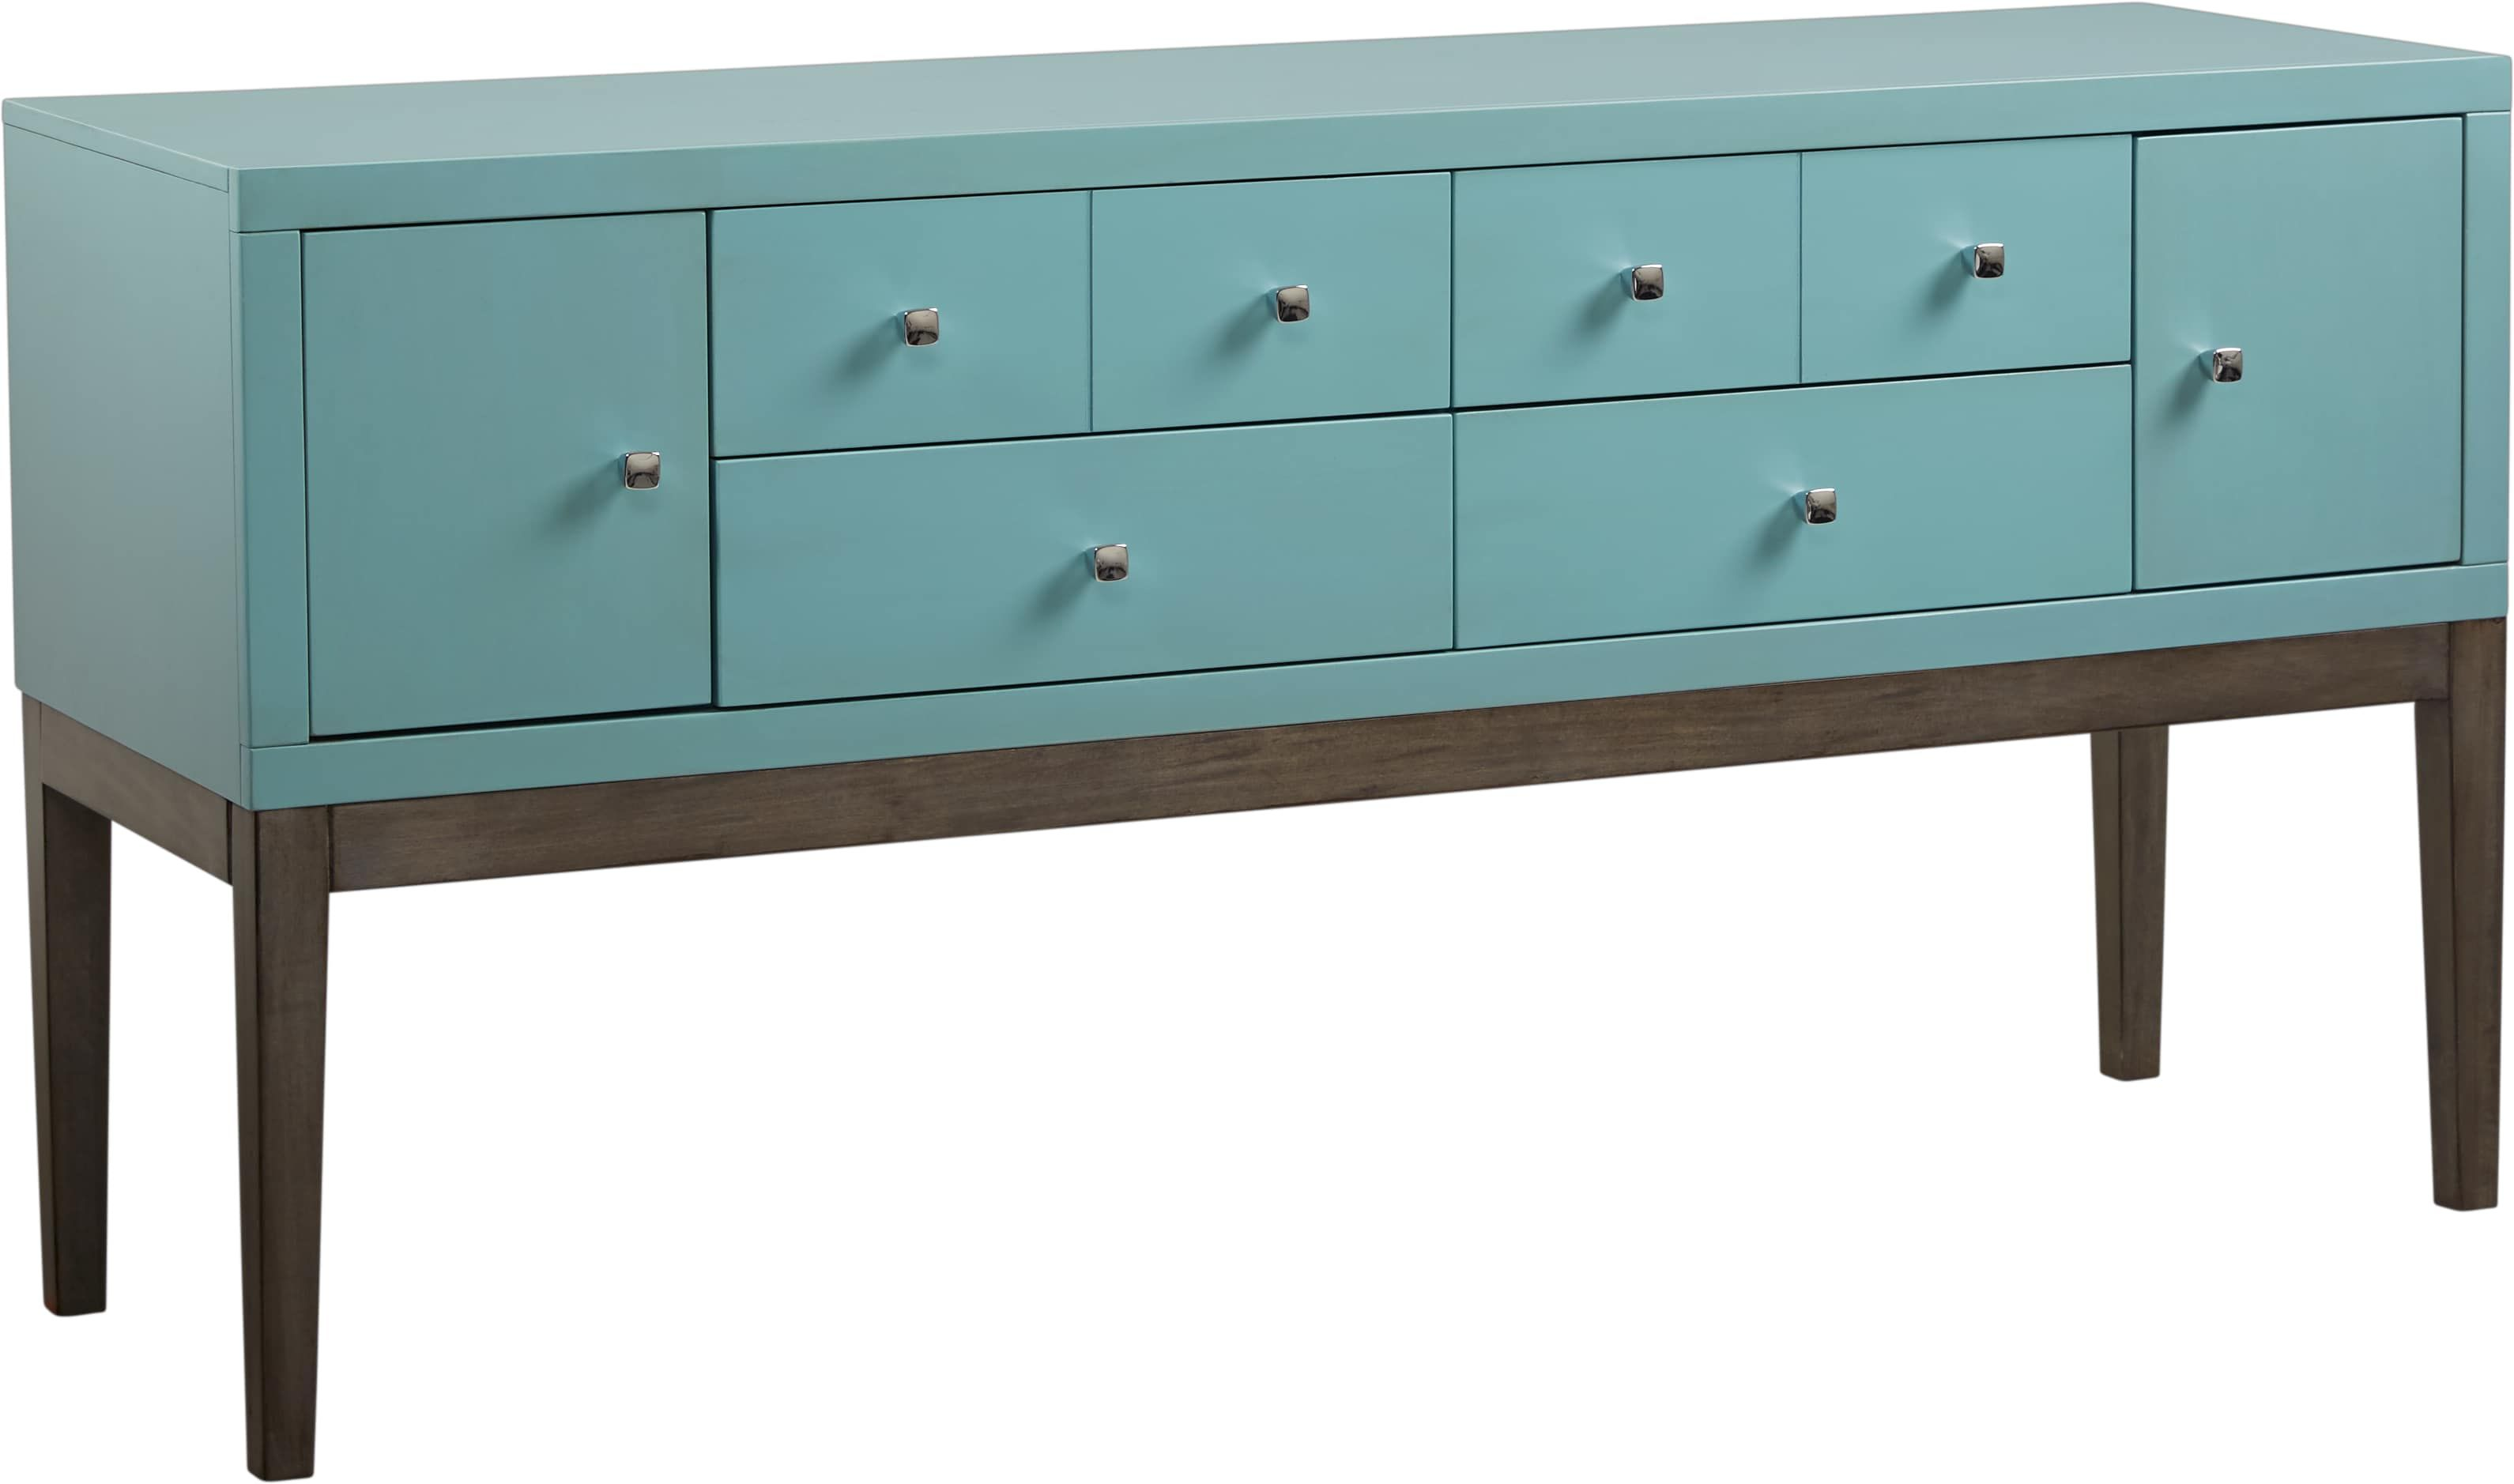 Skyler Spa Blue Credenza Stylish Storage Accent Cabinet Credenza